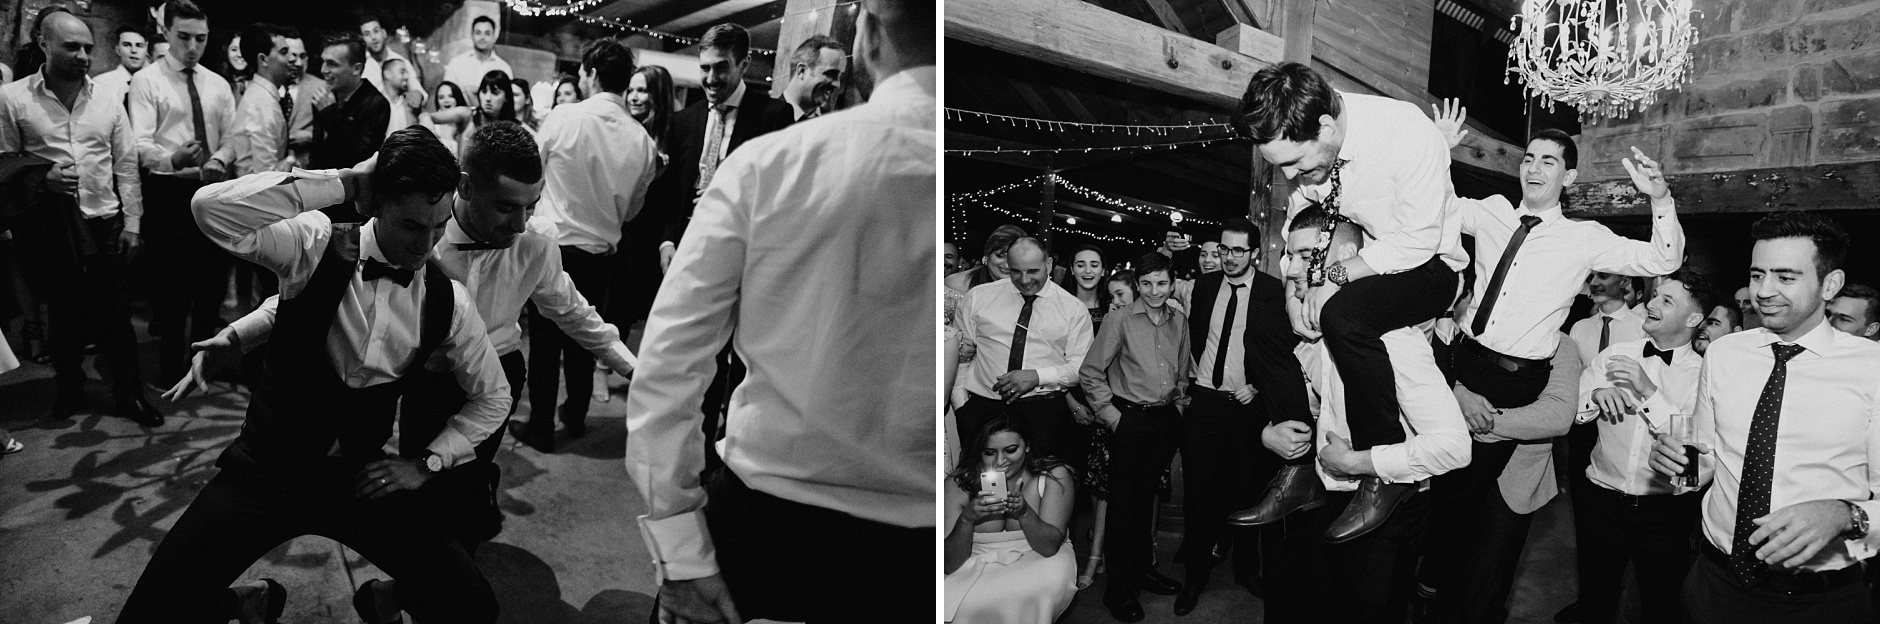 cassandra&cameron1355ab_Peppers-Creek-Wedding.jpg